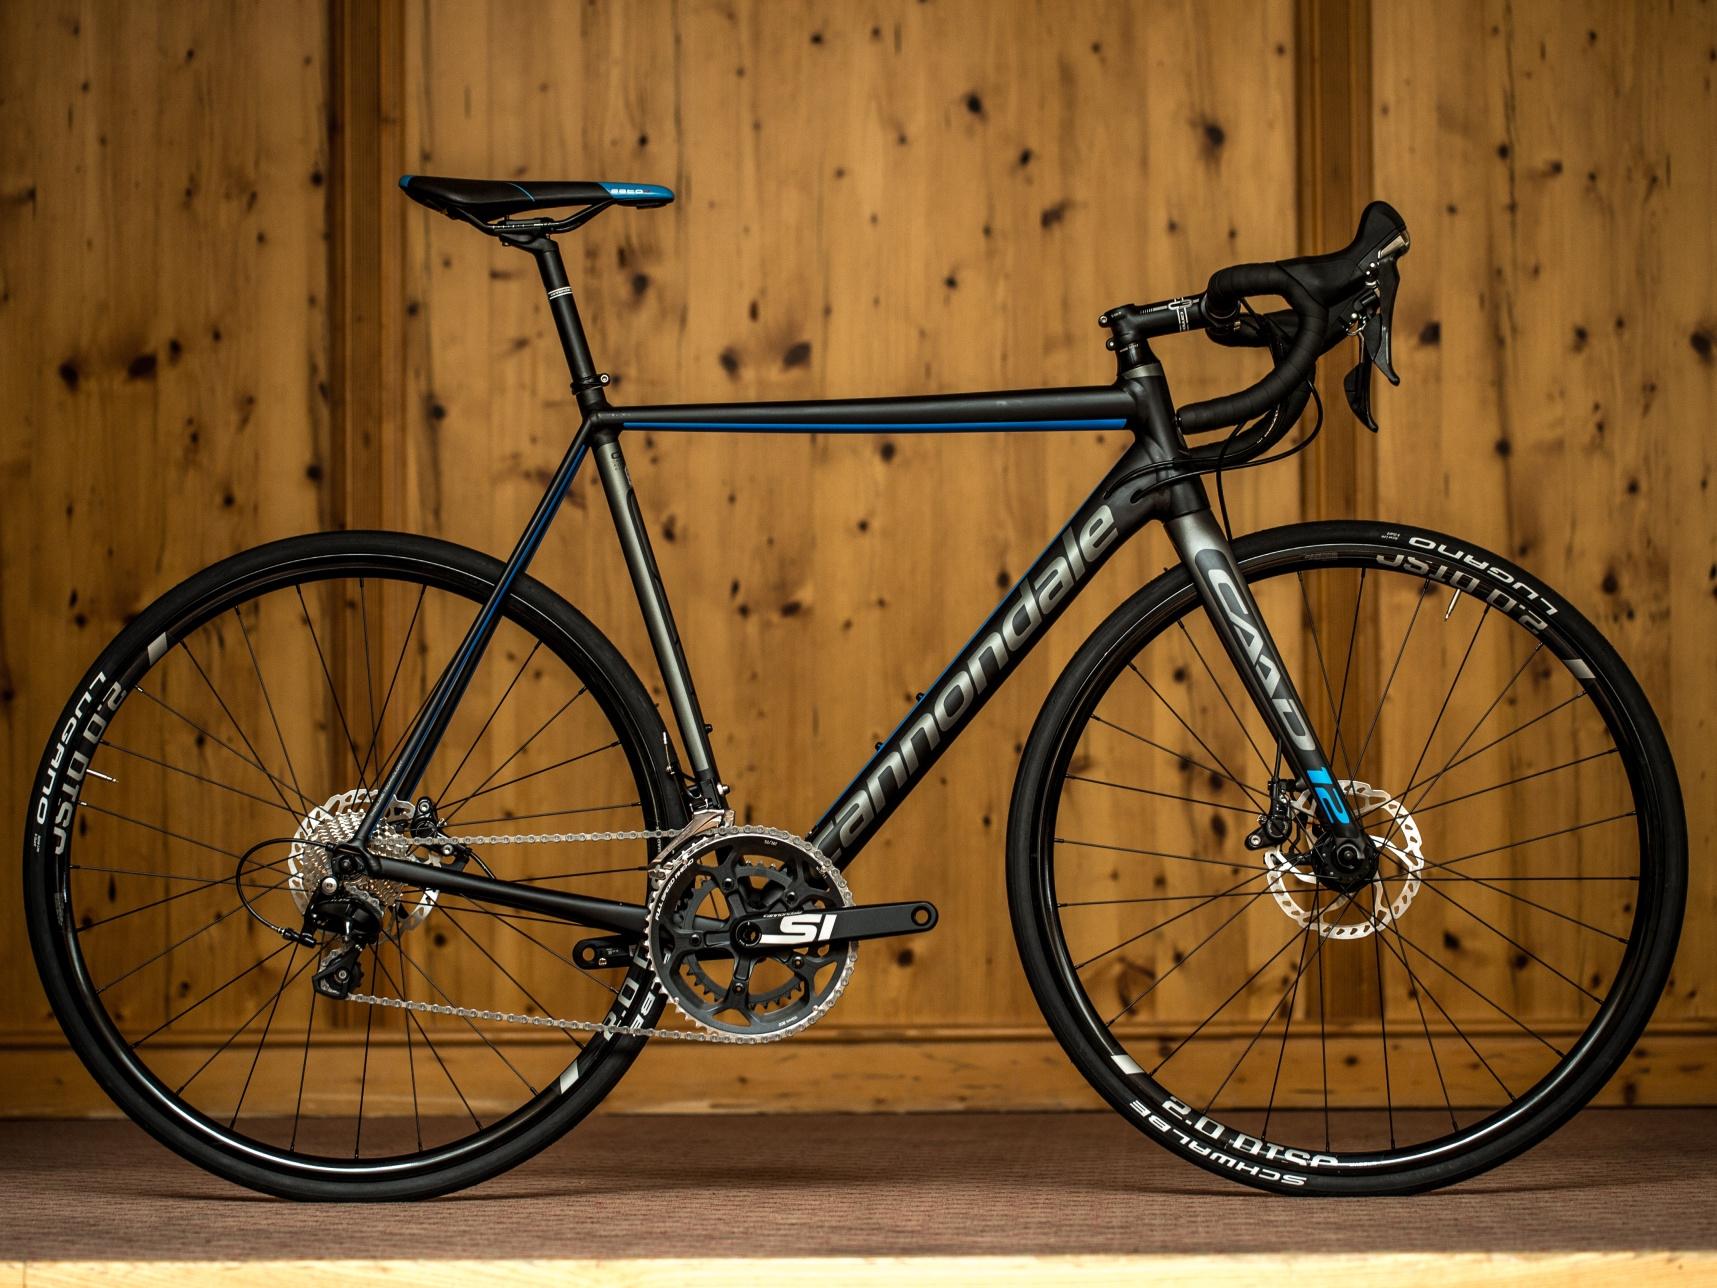 zAUSTRIA 2015_bikes_By AleDiLullo-6533